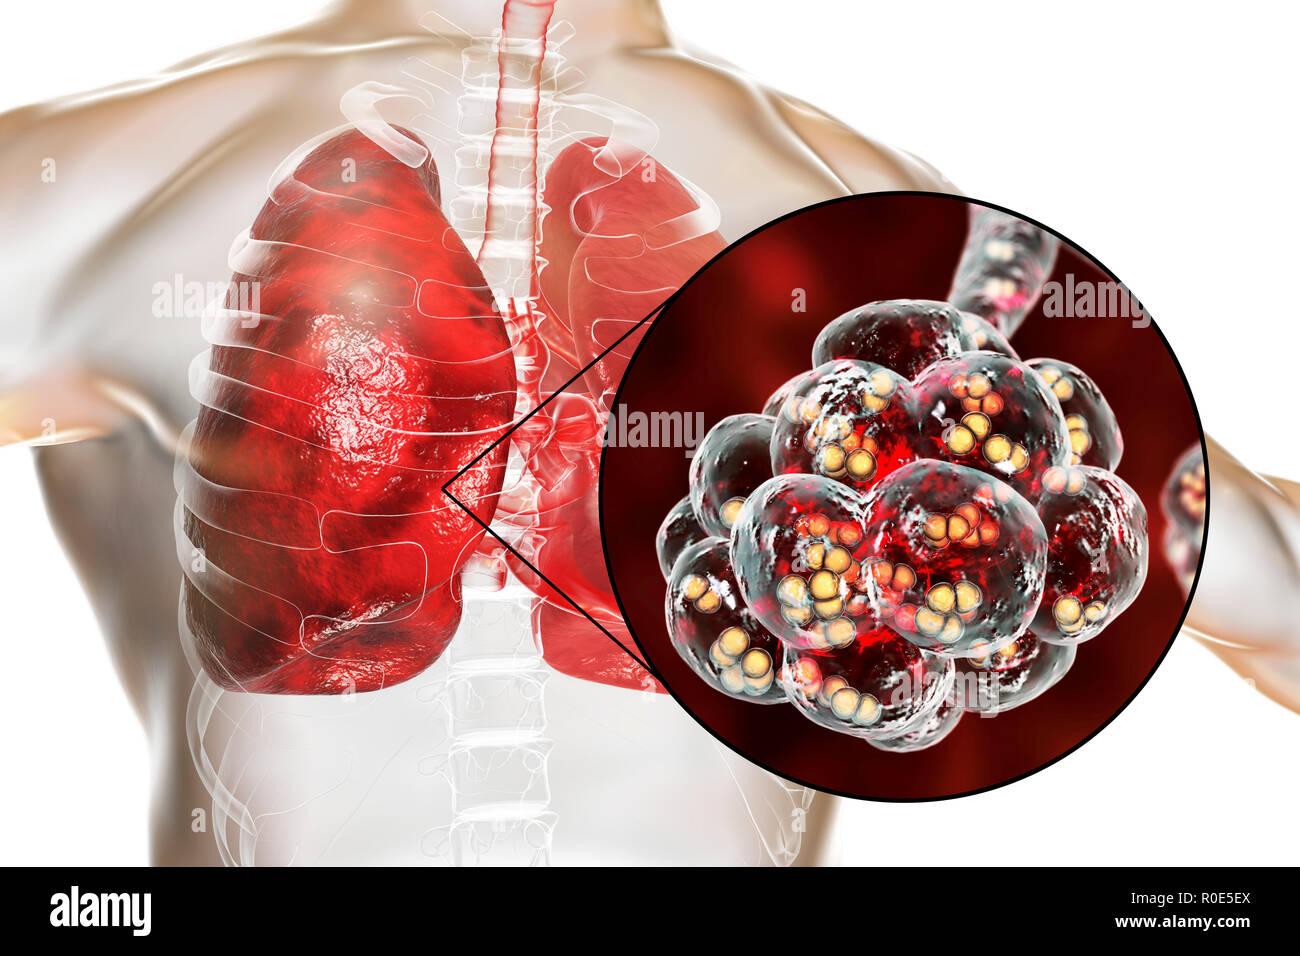 Pneumococcal pneumonia. Computer illustration of Streptococcus pneumoniae (pneumococci) bacteria inside the alveoli of the lungs, causing pneumonia. - Stock Image